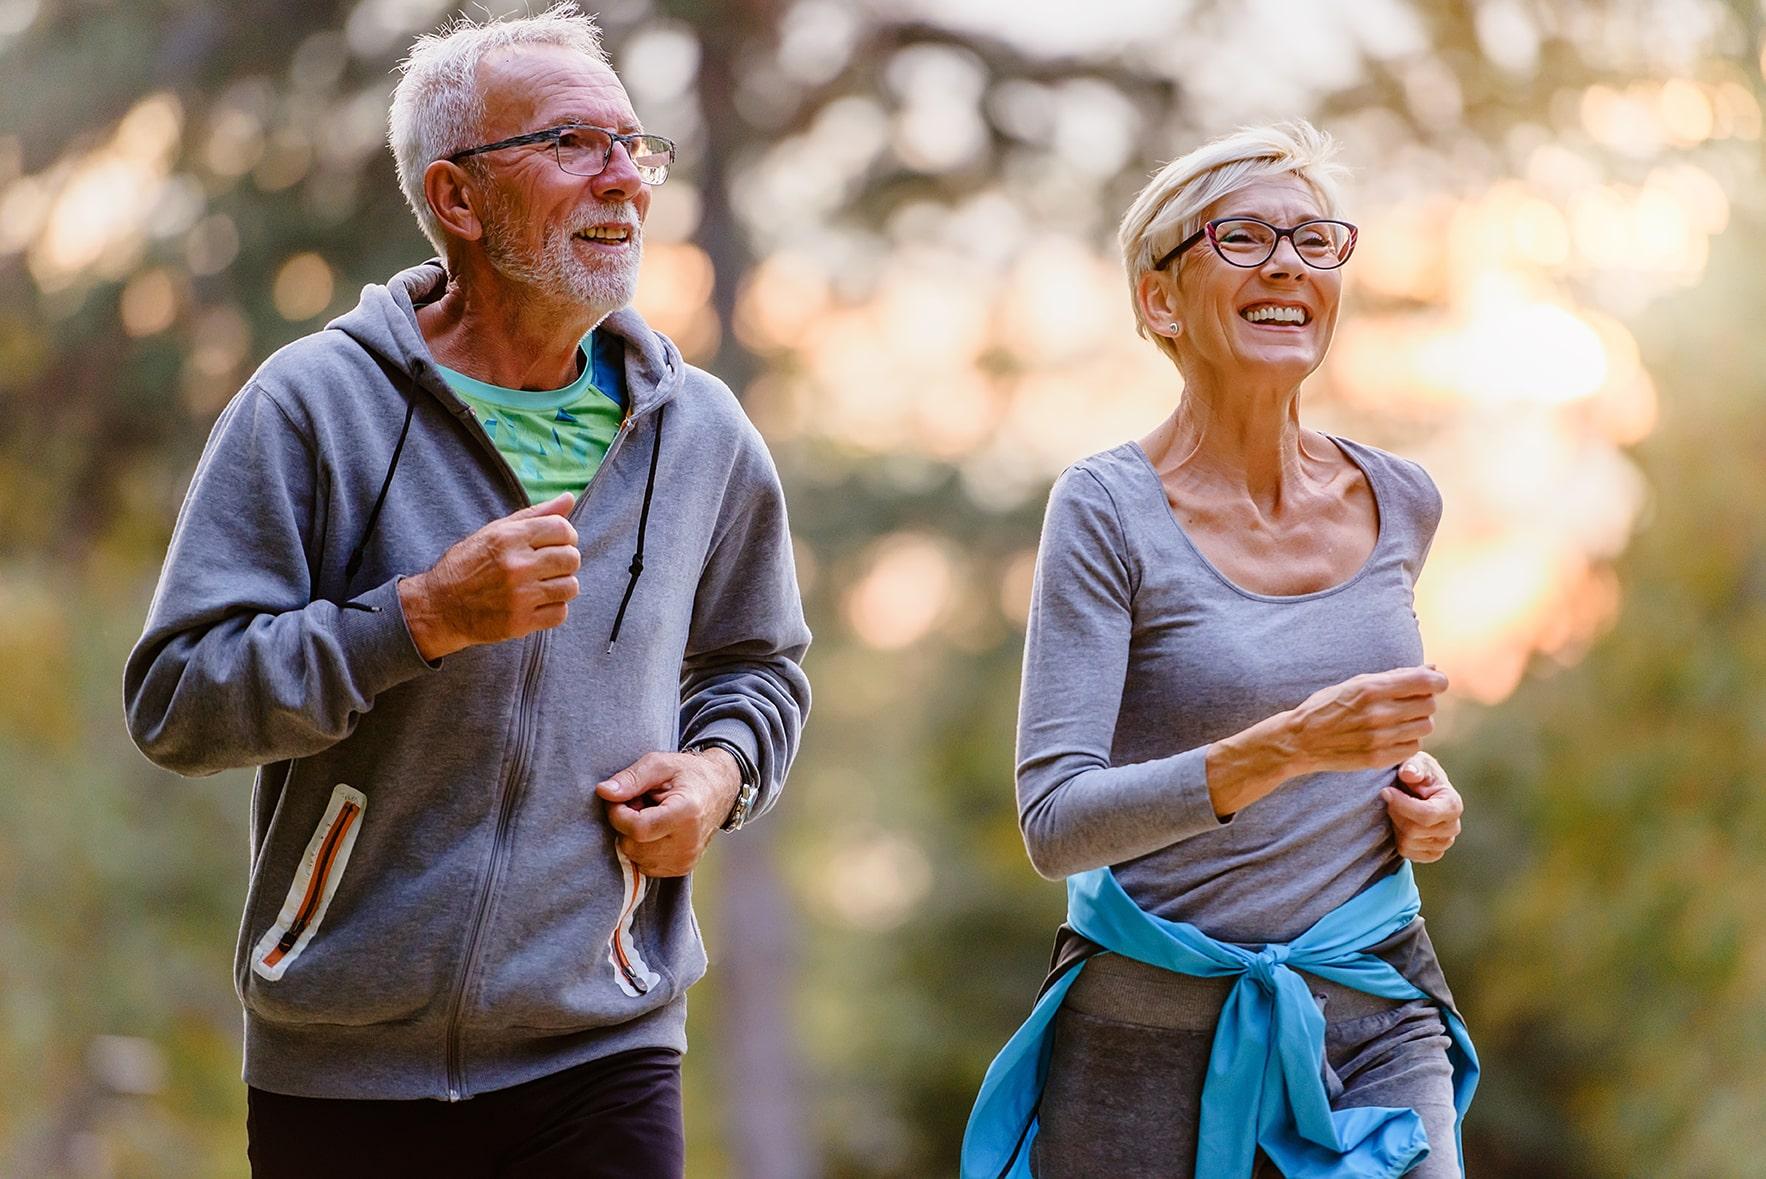 outdoor cheerful hikers on jog